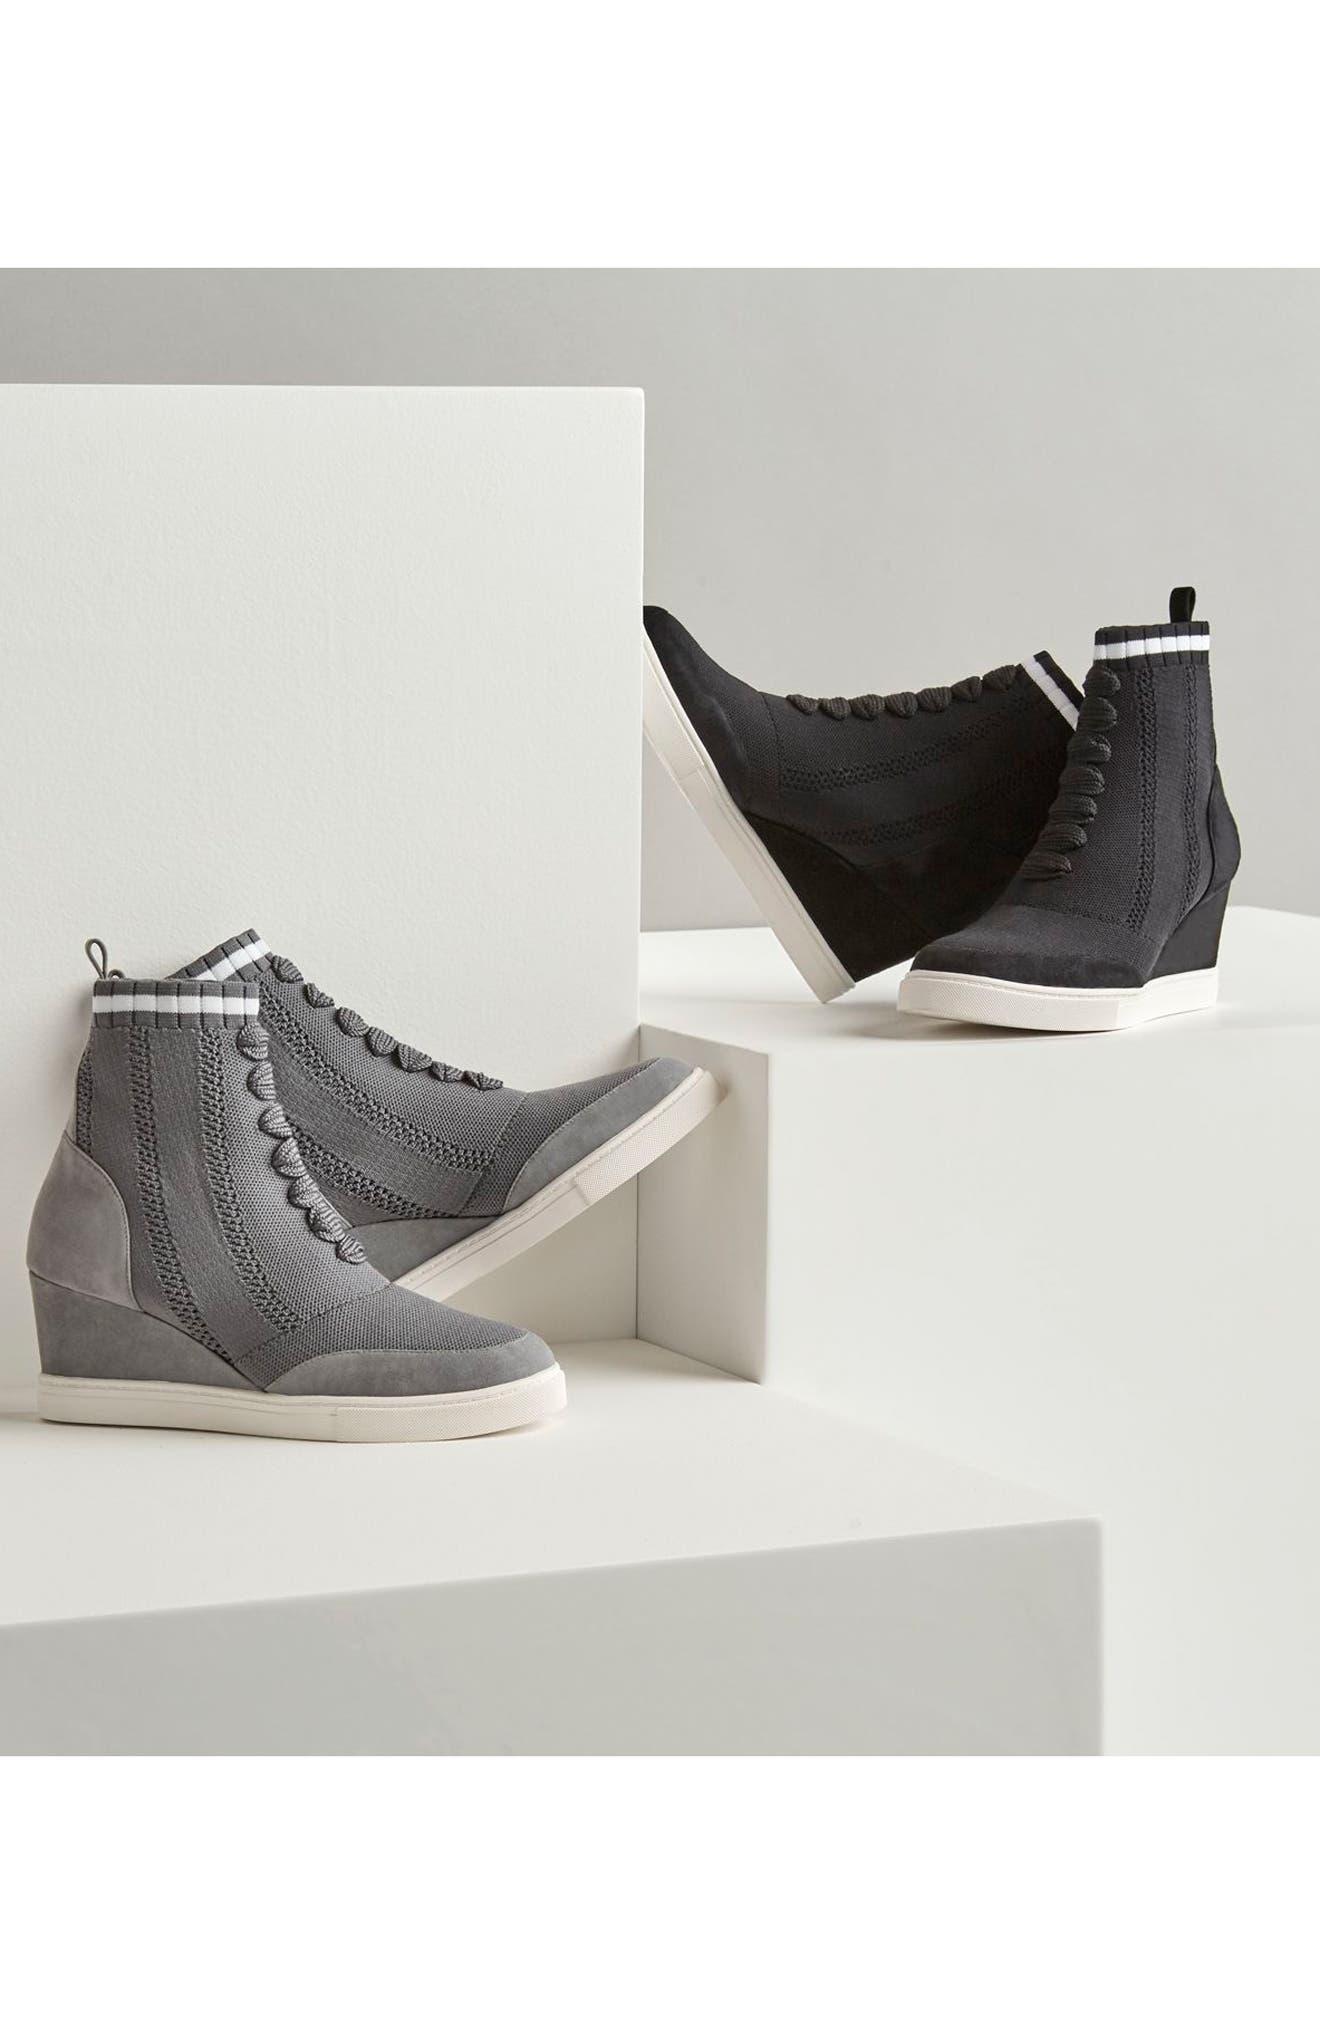 Fabiana Wedge Sneaker,                             Alternate thumbnail 8, color,                             BLACK SUEDE